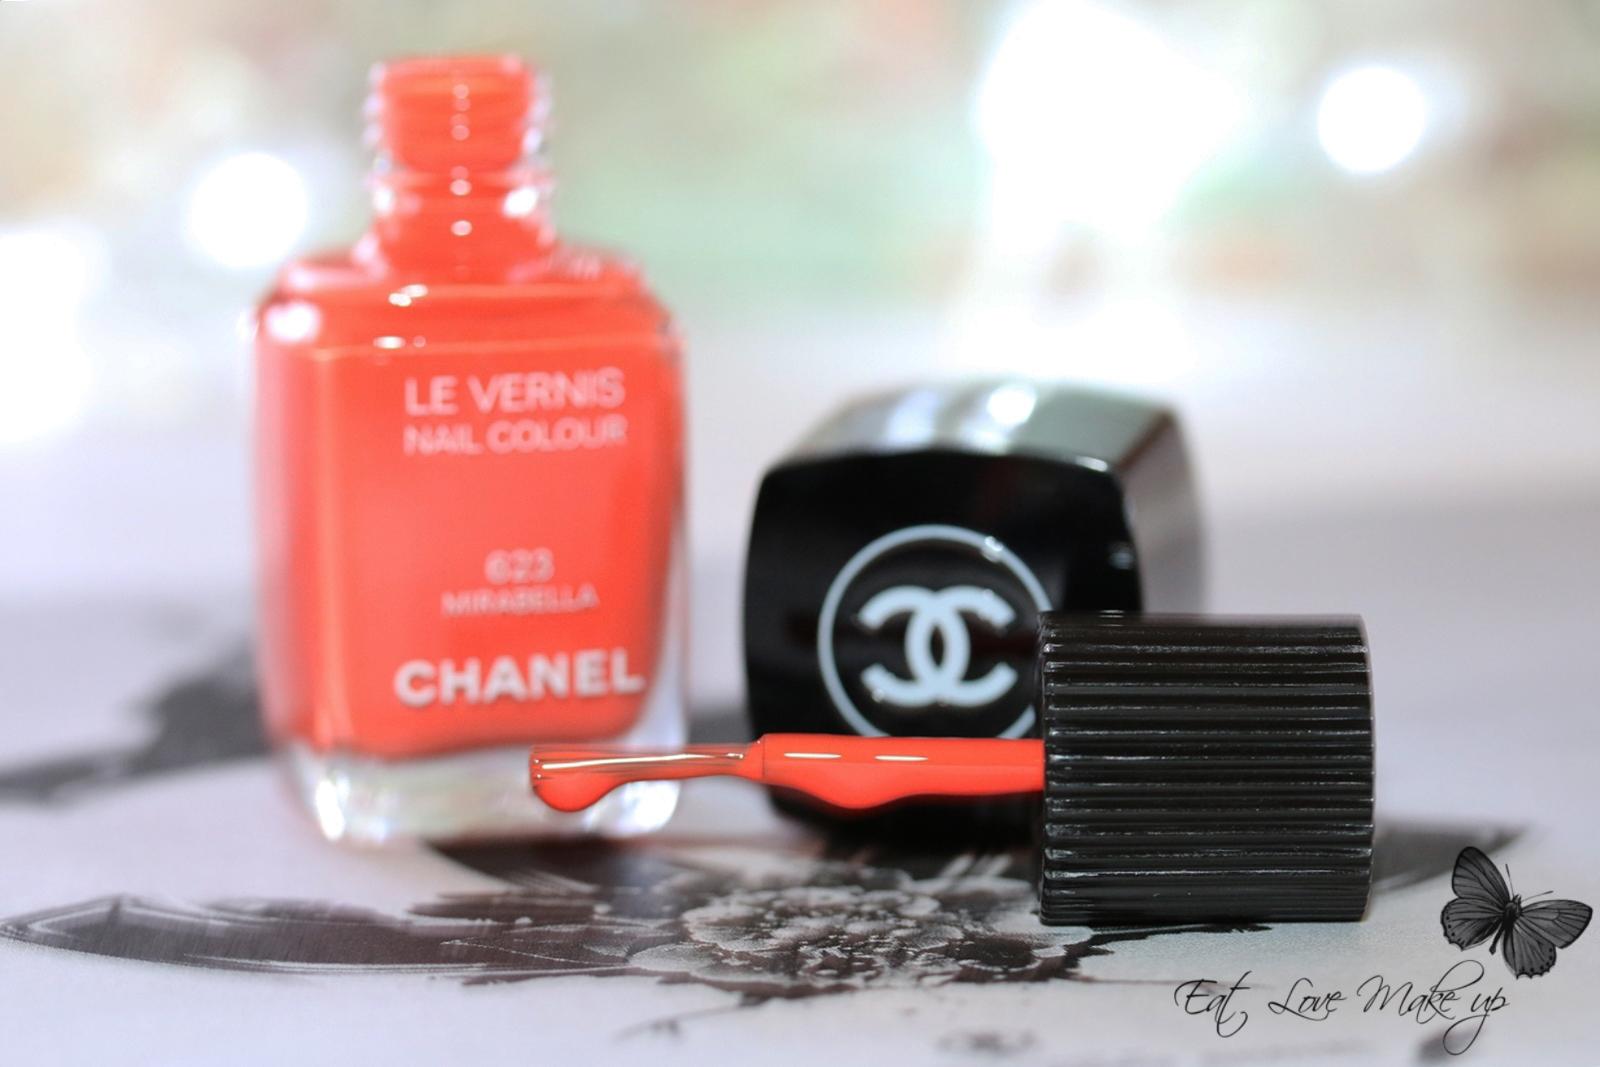 Chanel Le Vernis 623 Mirabella